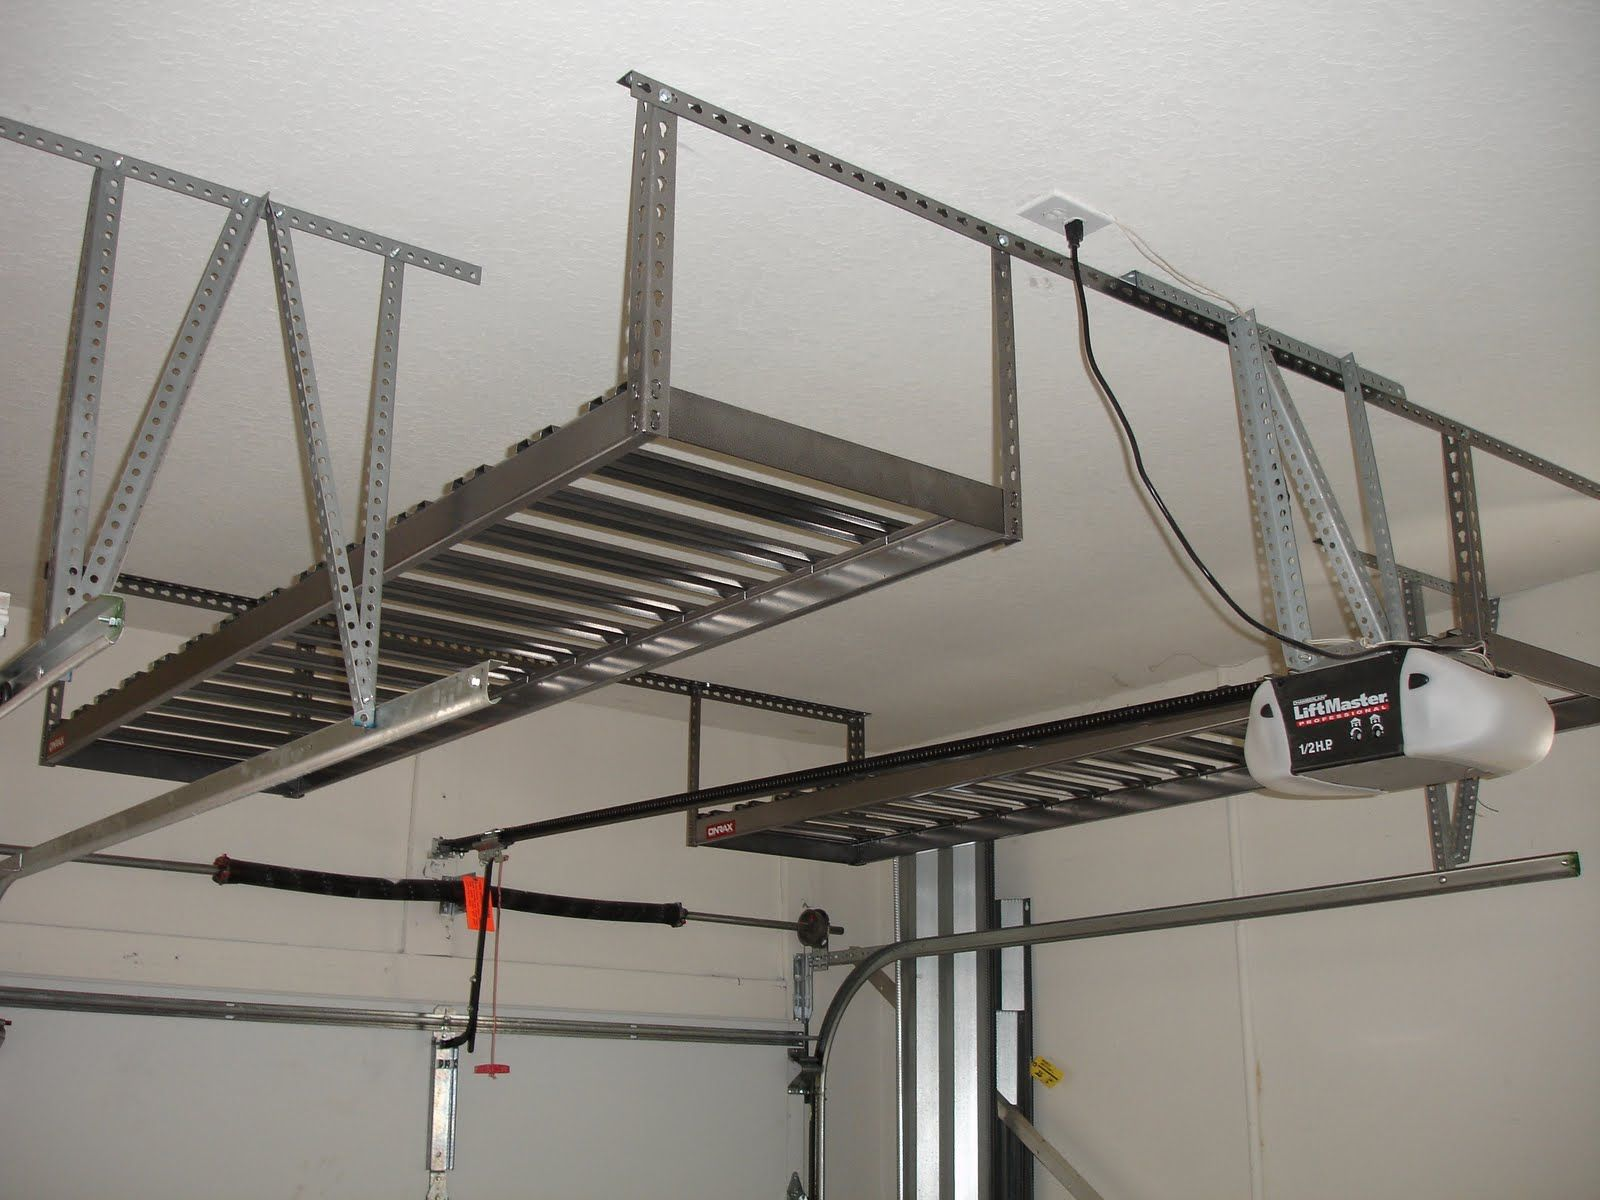 images about ceiling overhead storage ideas on pinterest bike storage storage ideas